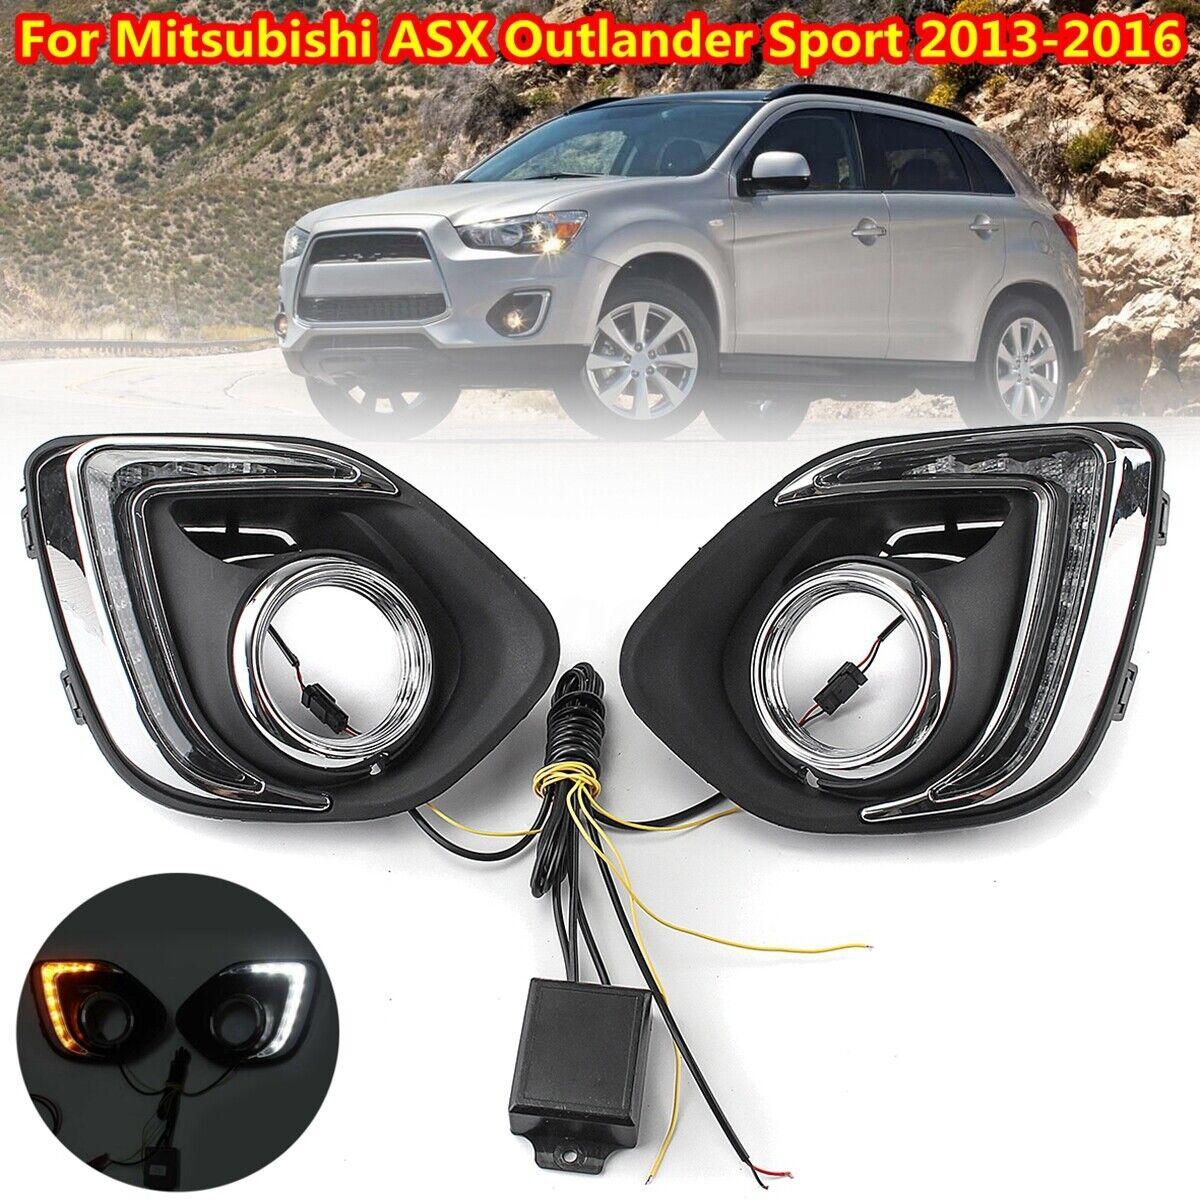 For 2013 2014 2015 Mitsubishi ASX Outlander Sport LED Daytime DRL Light Fog Lamp